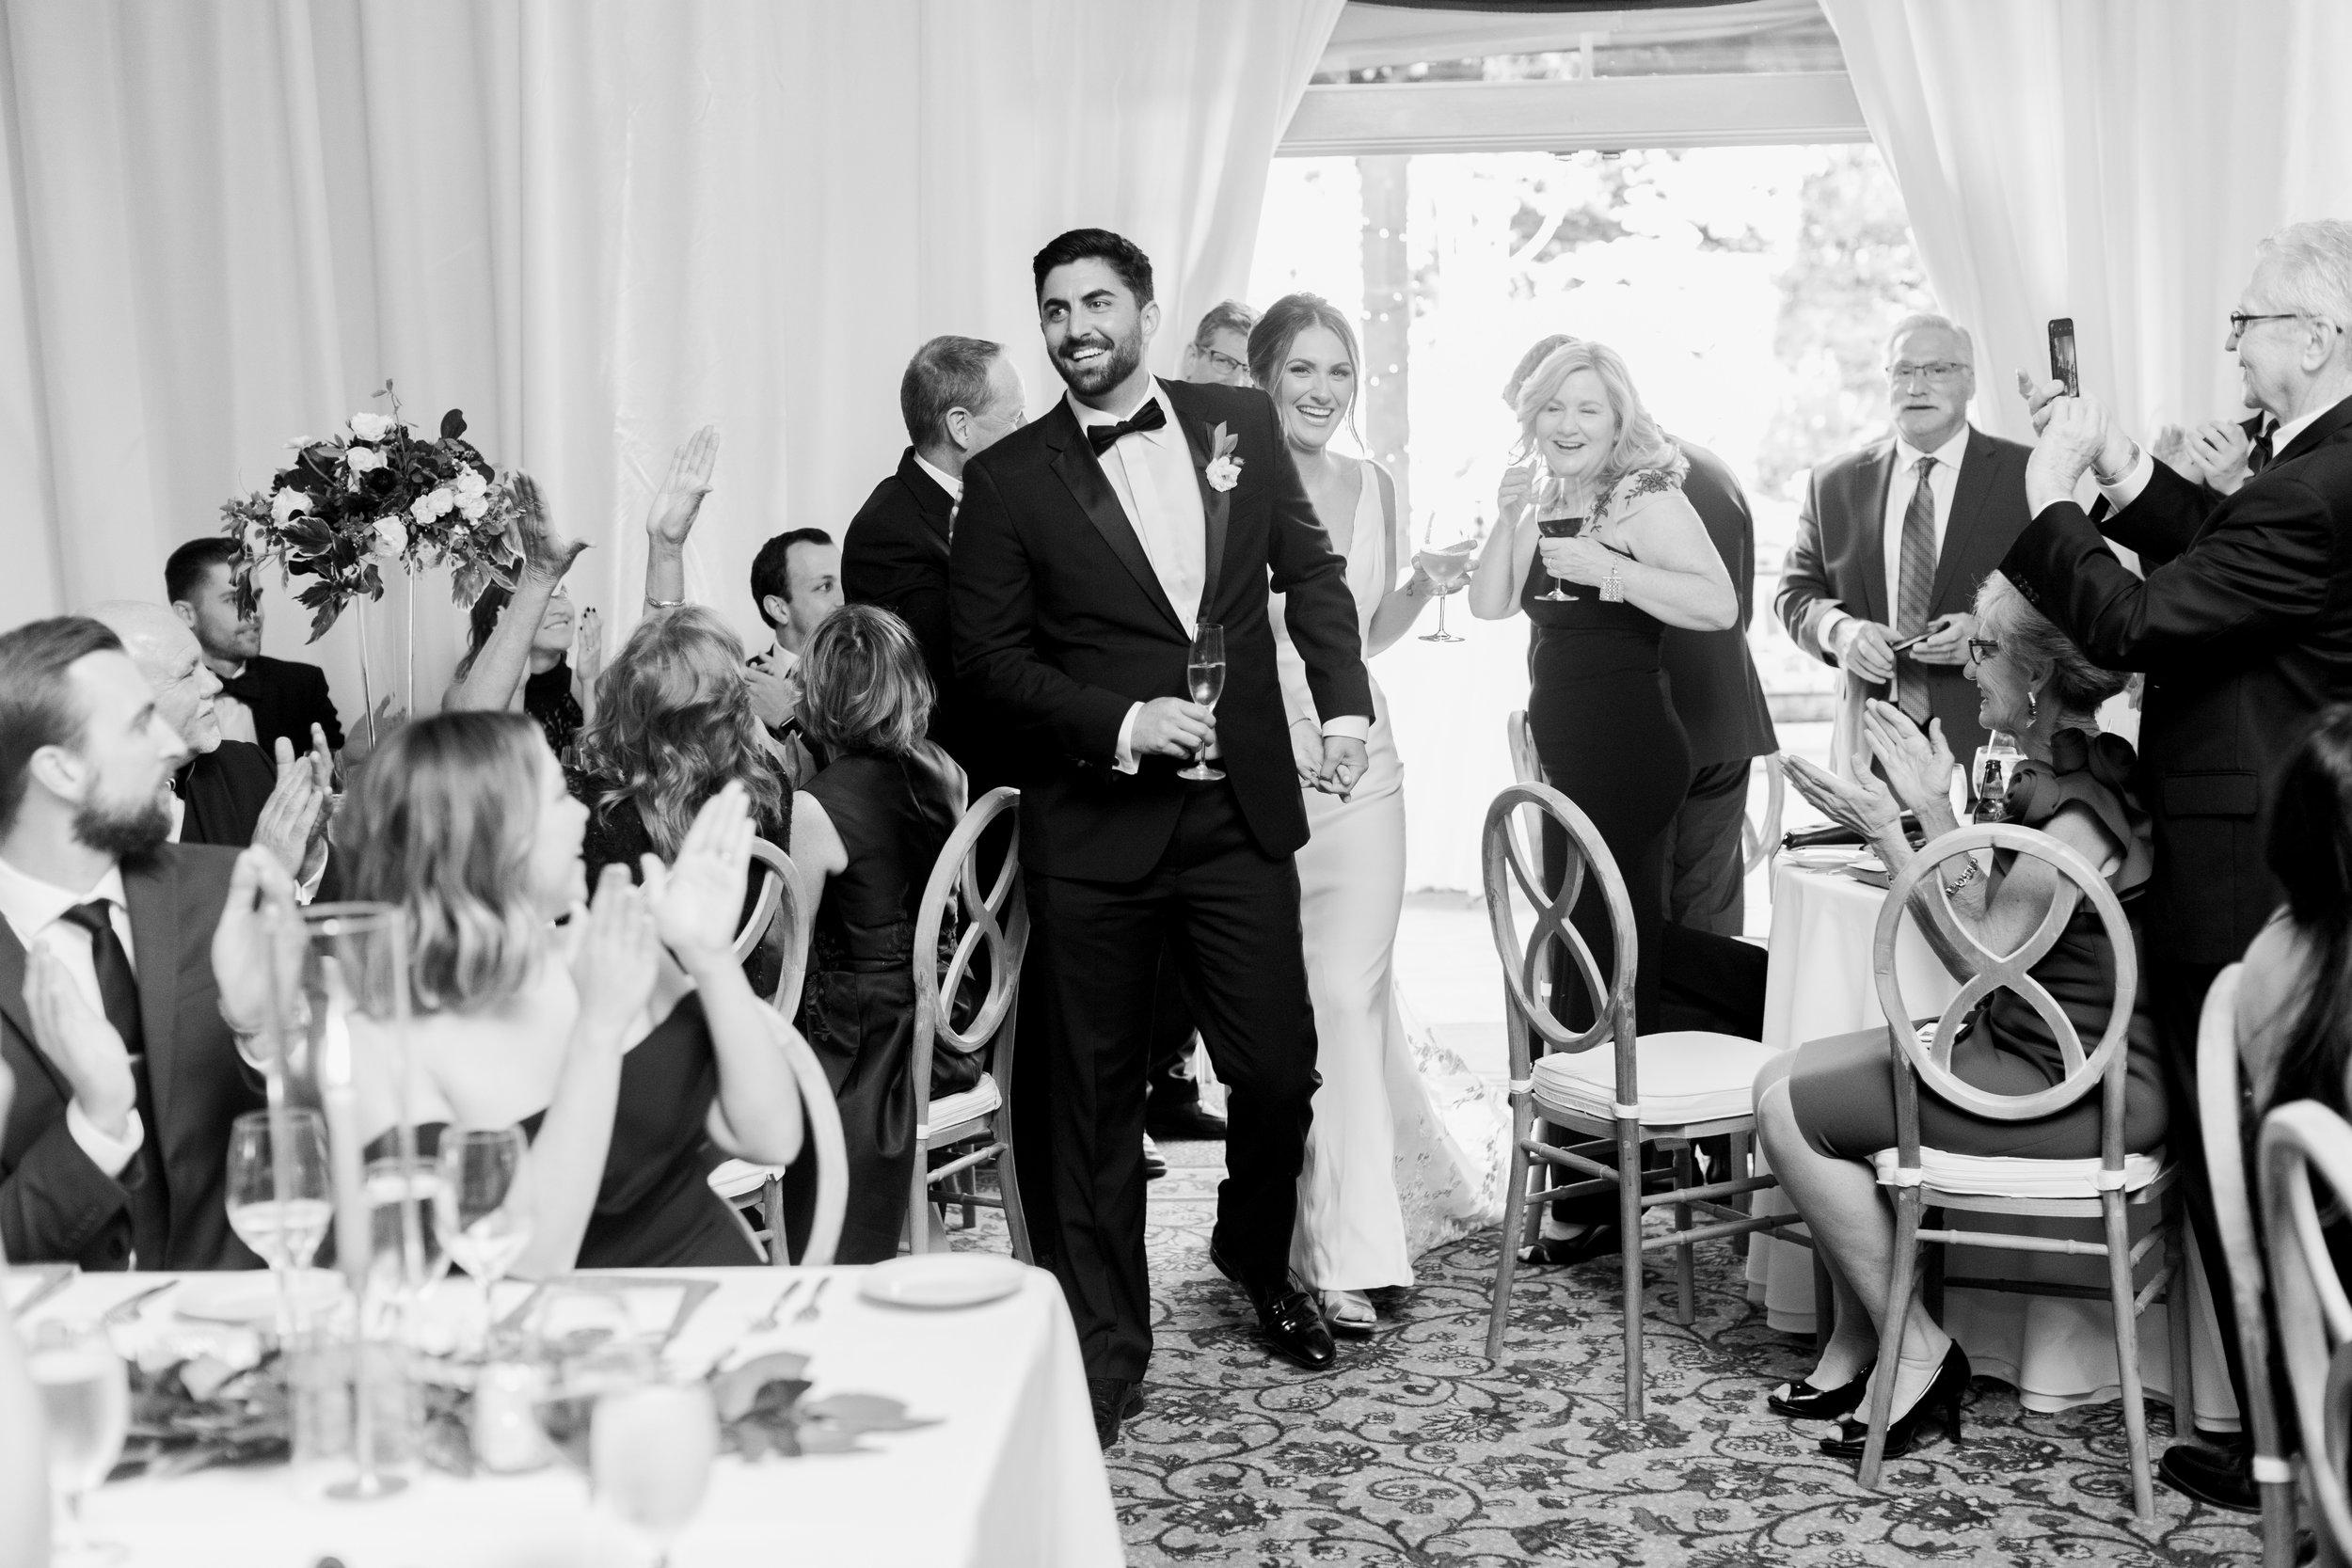 vintners-inn-wedding-in-santa-rosa-california-83.jpg